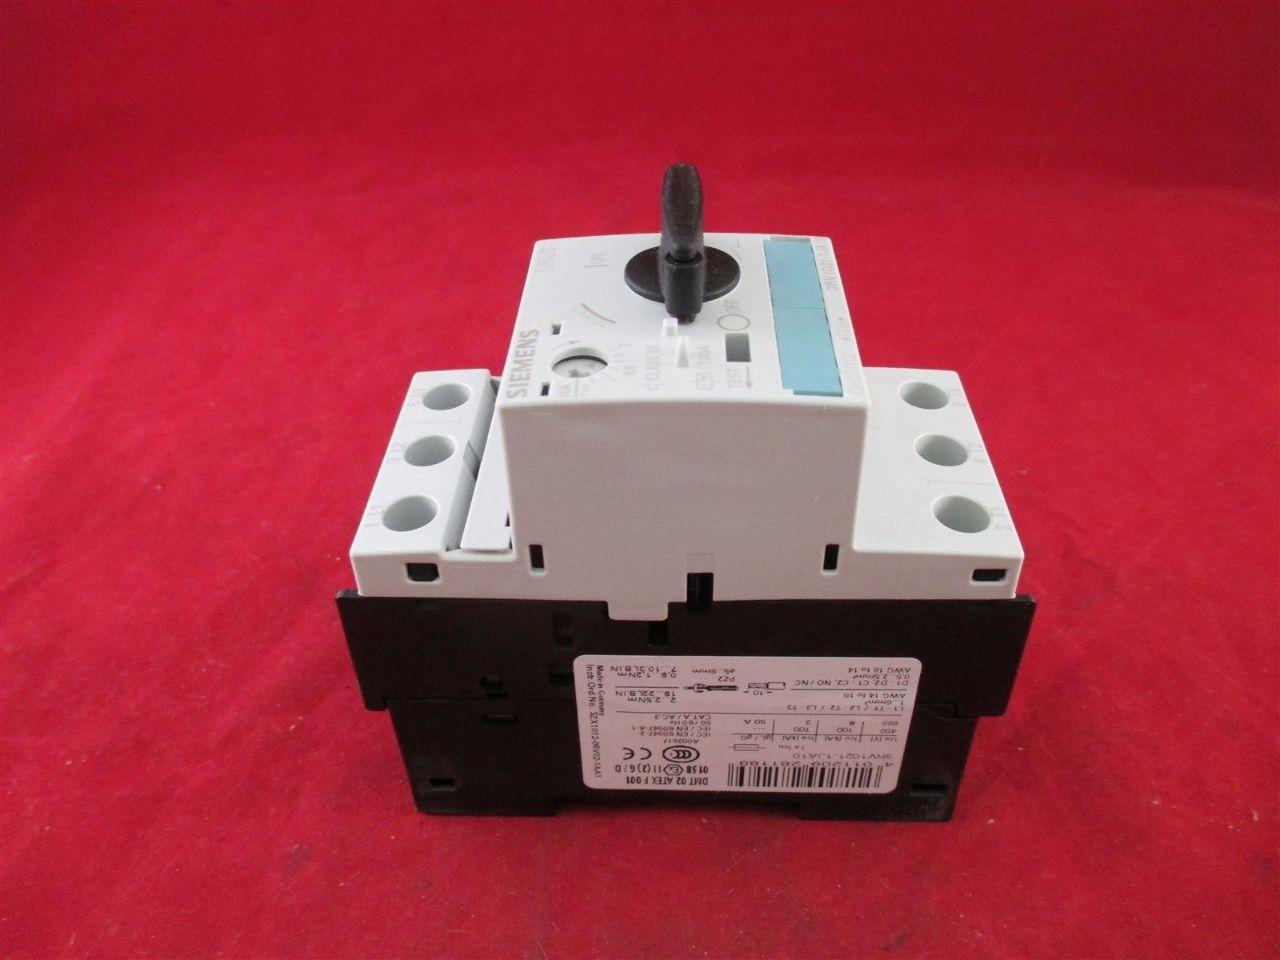 Siemens 3rv1021 1ja10 manual motor starter new process for Siemens manual motor starter